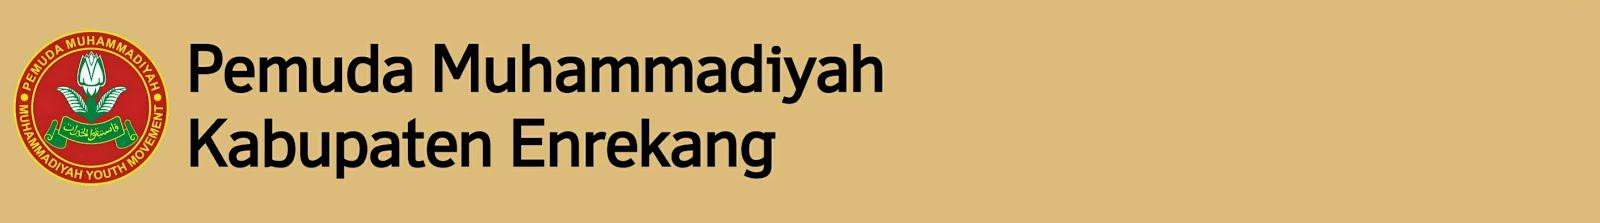 Pemuda Muhammadiyah Enrekang